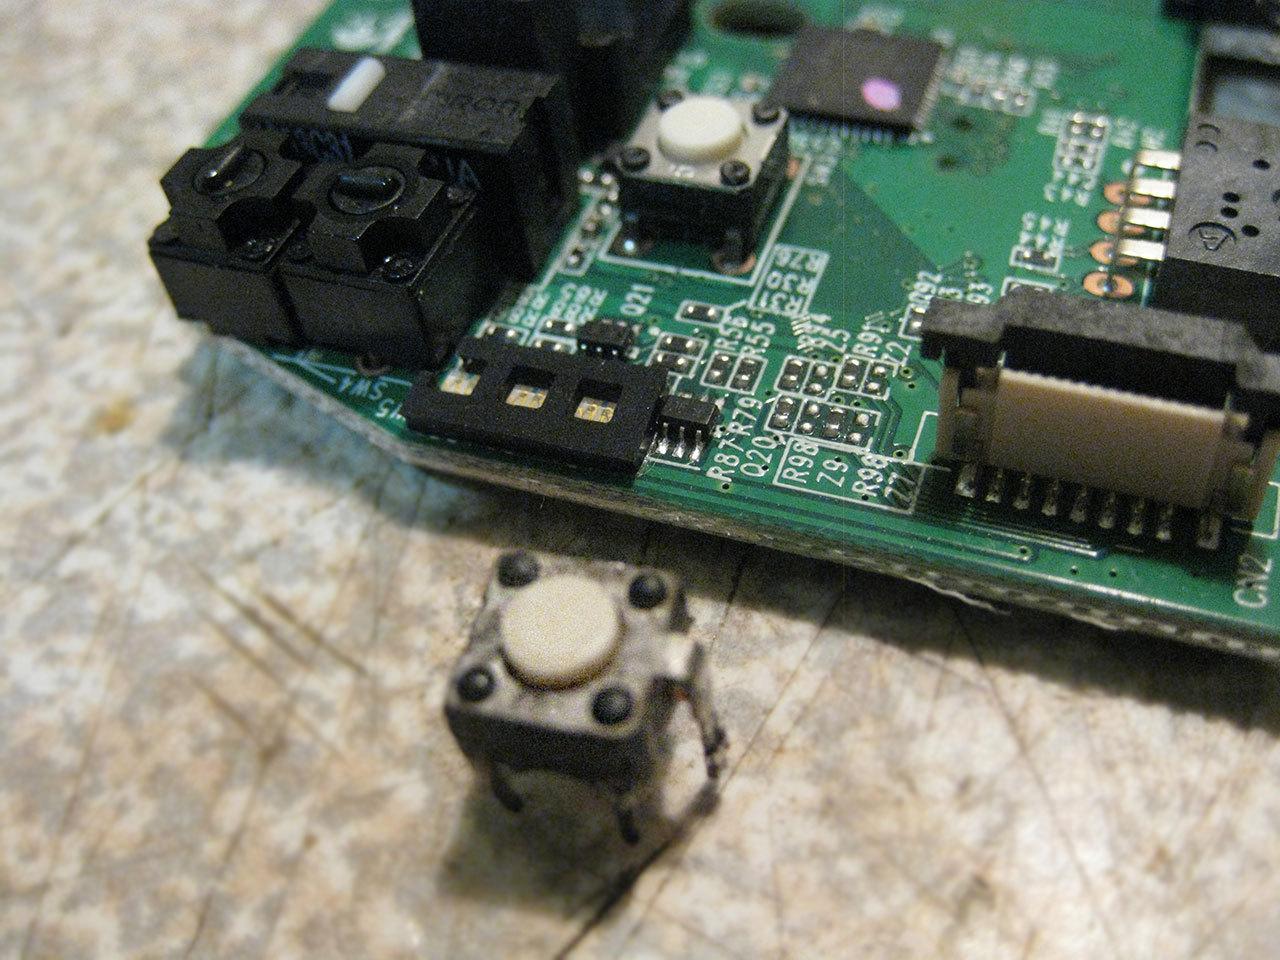 Замена умершей средней кнопки мыши Logitech G602 - 5